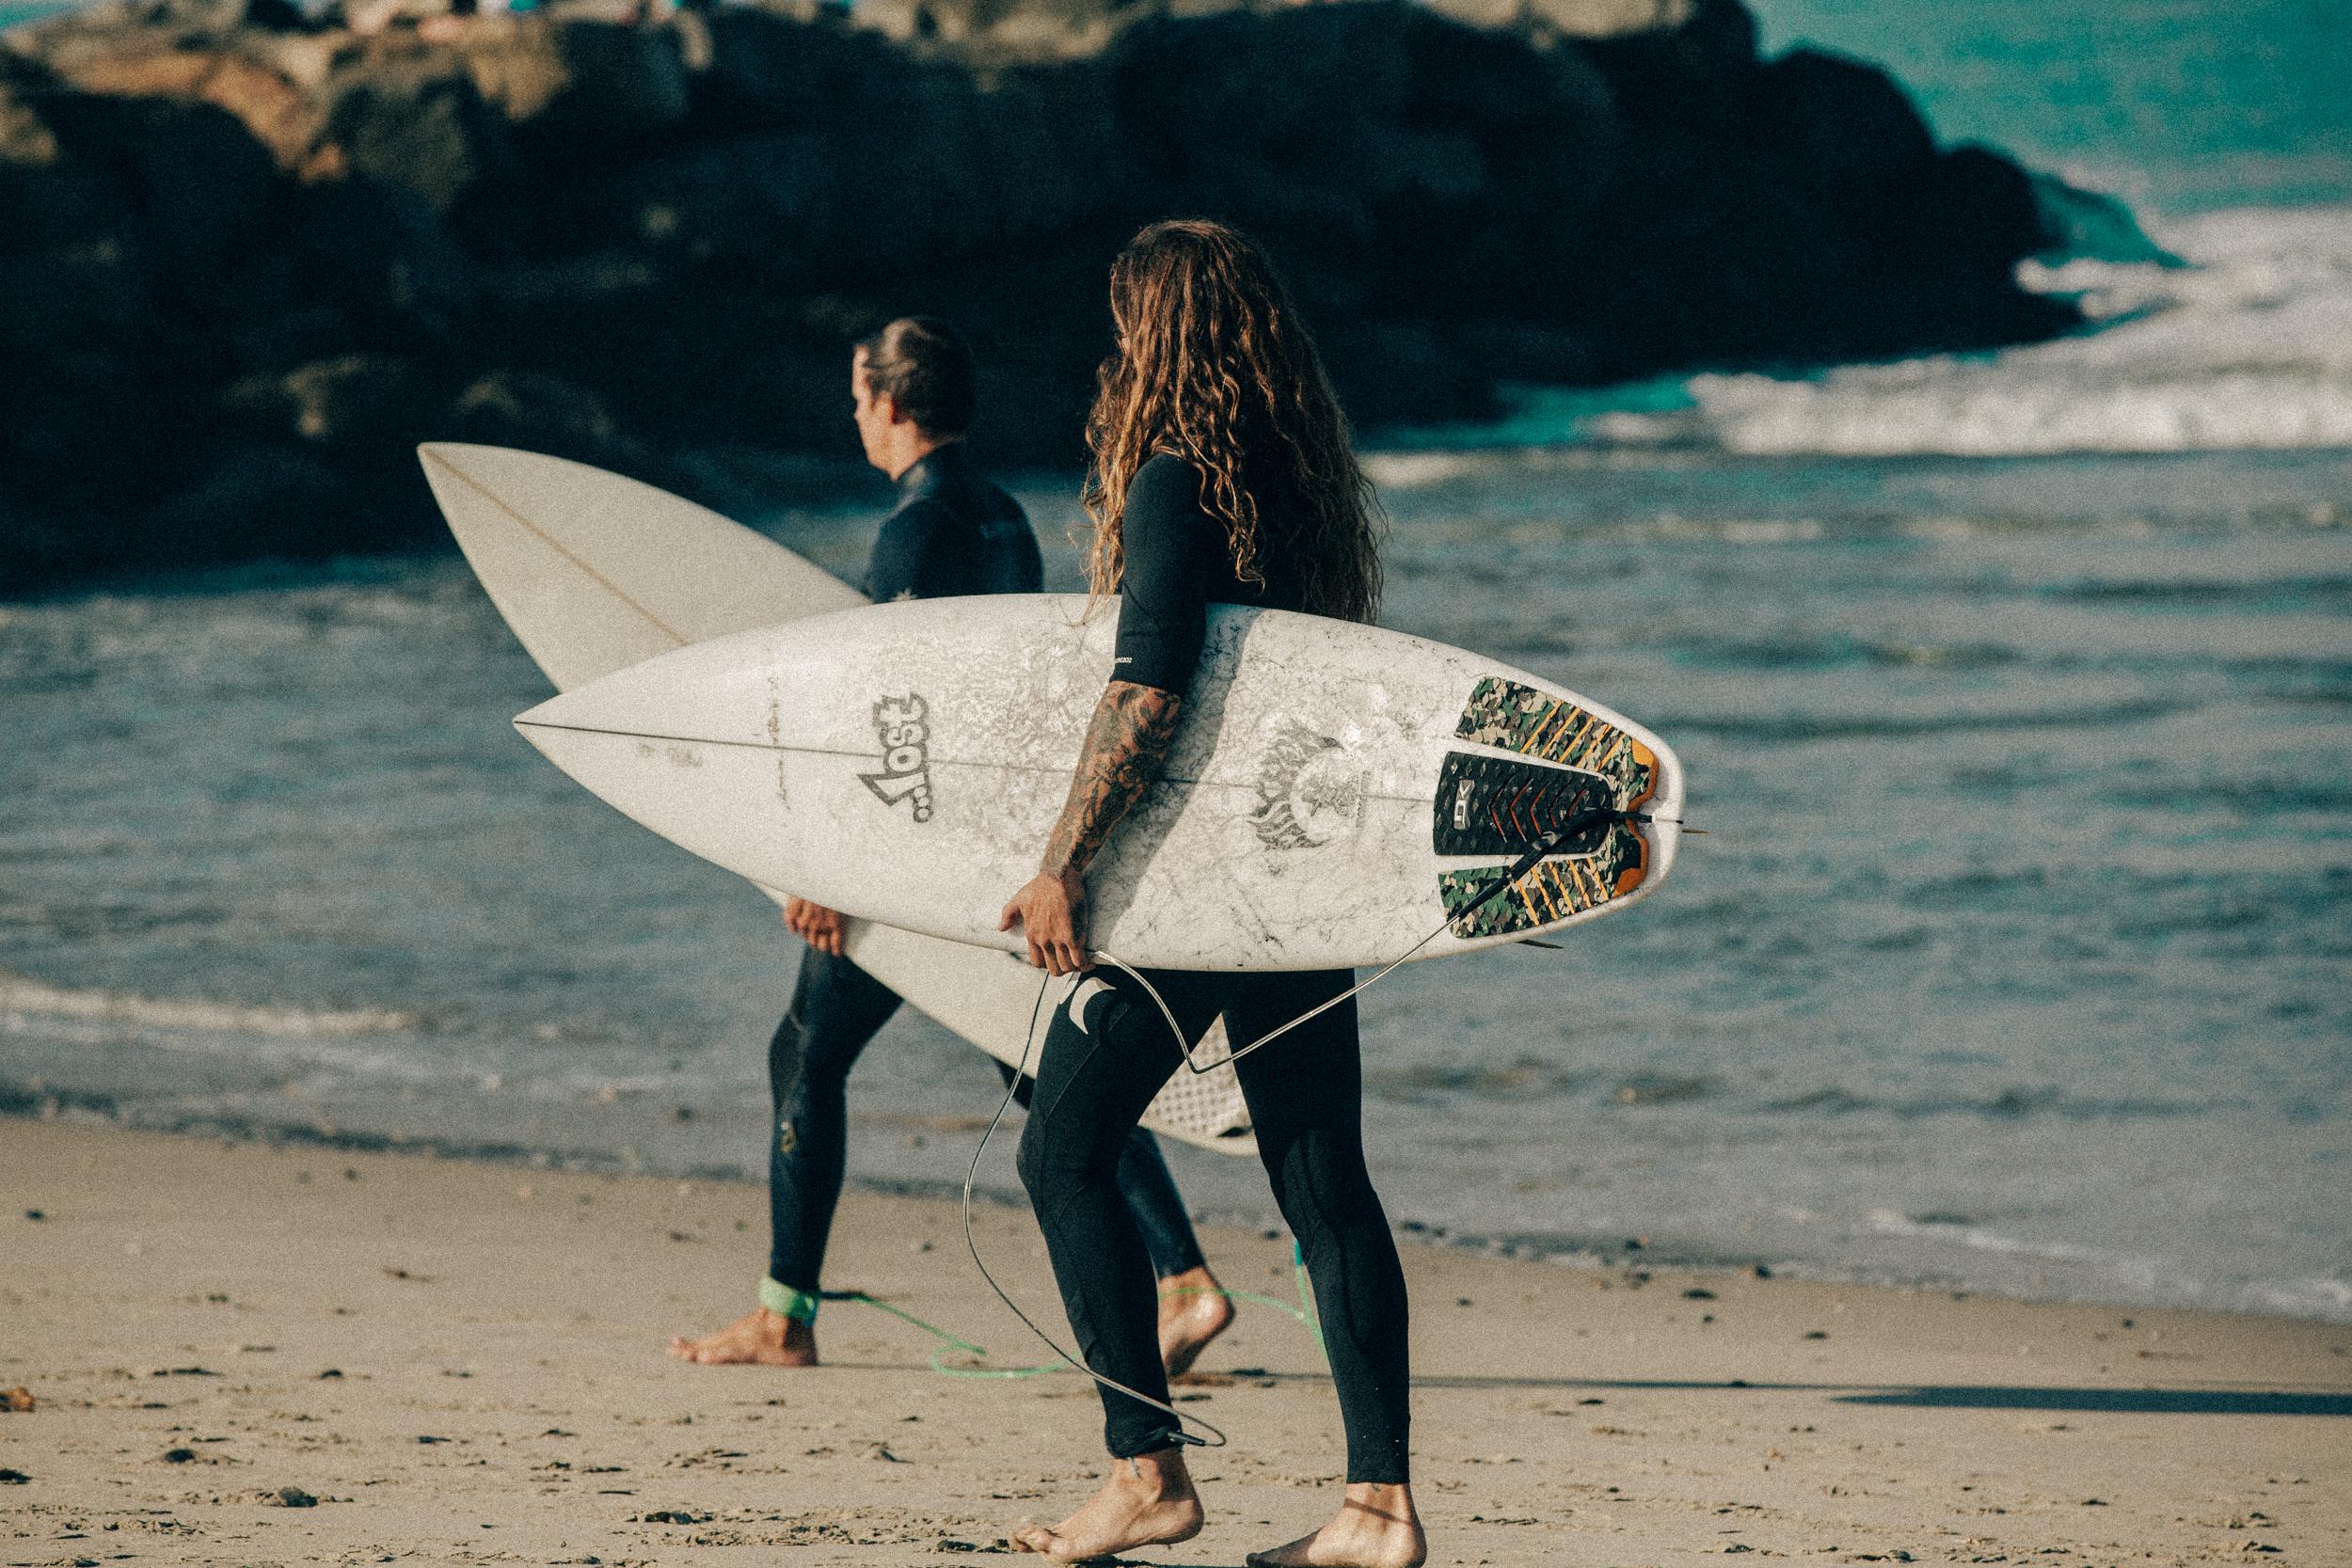 Surf_Newport_July29-22.JPG